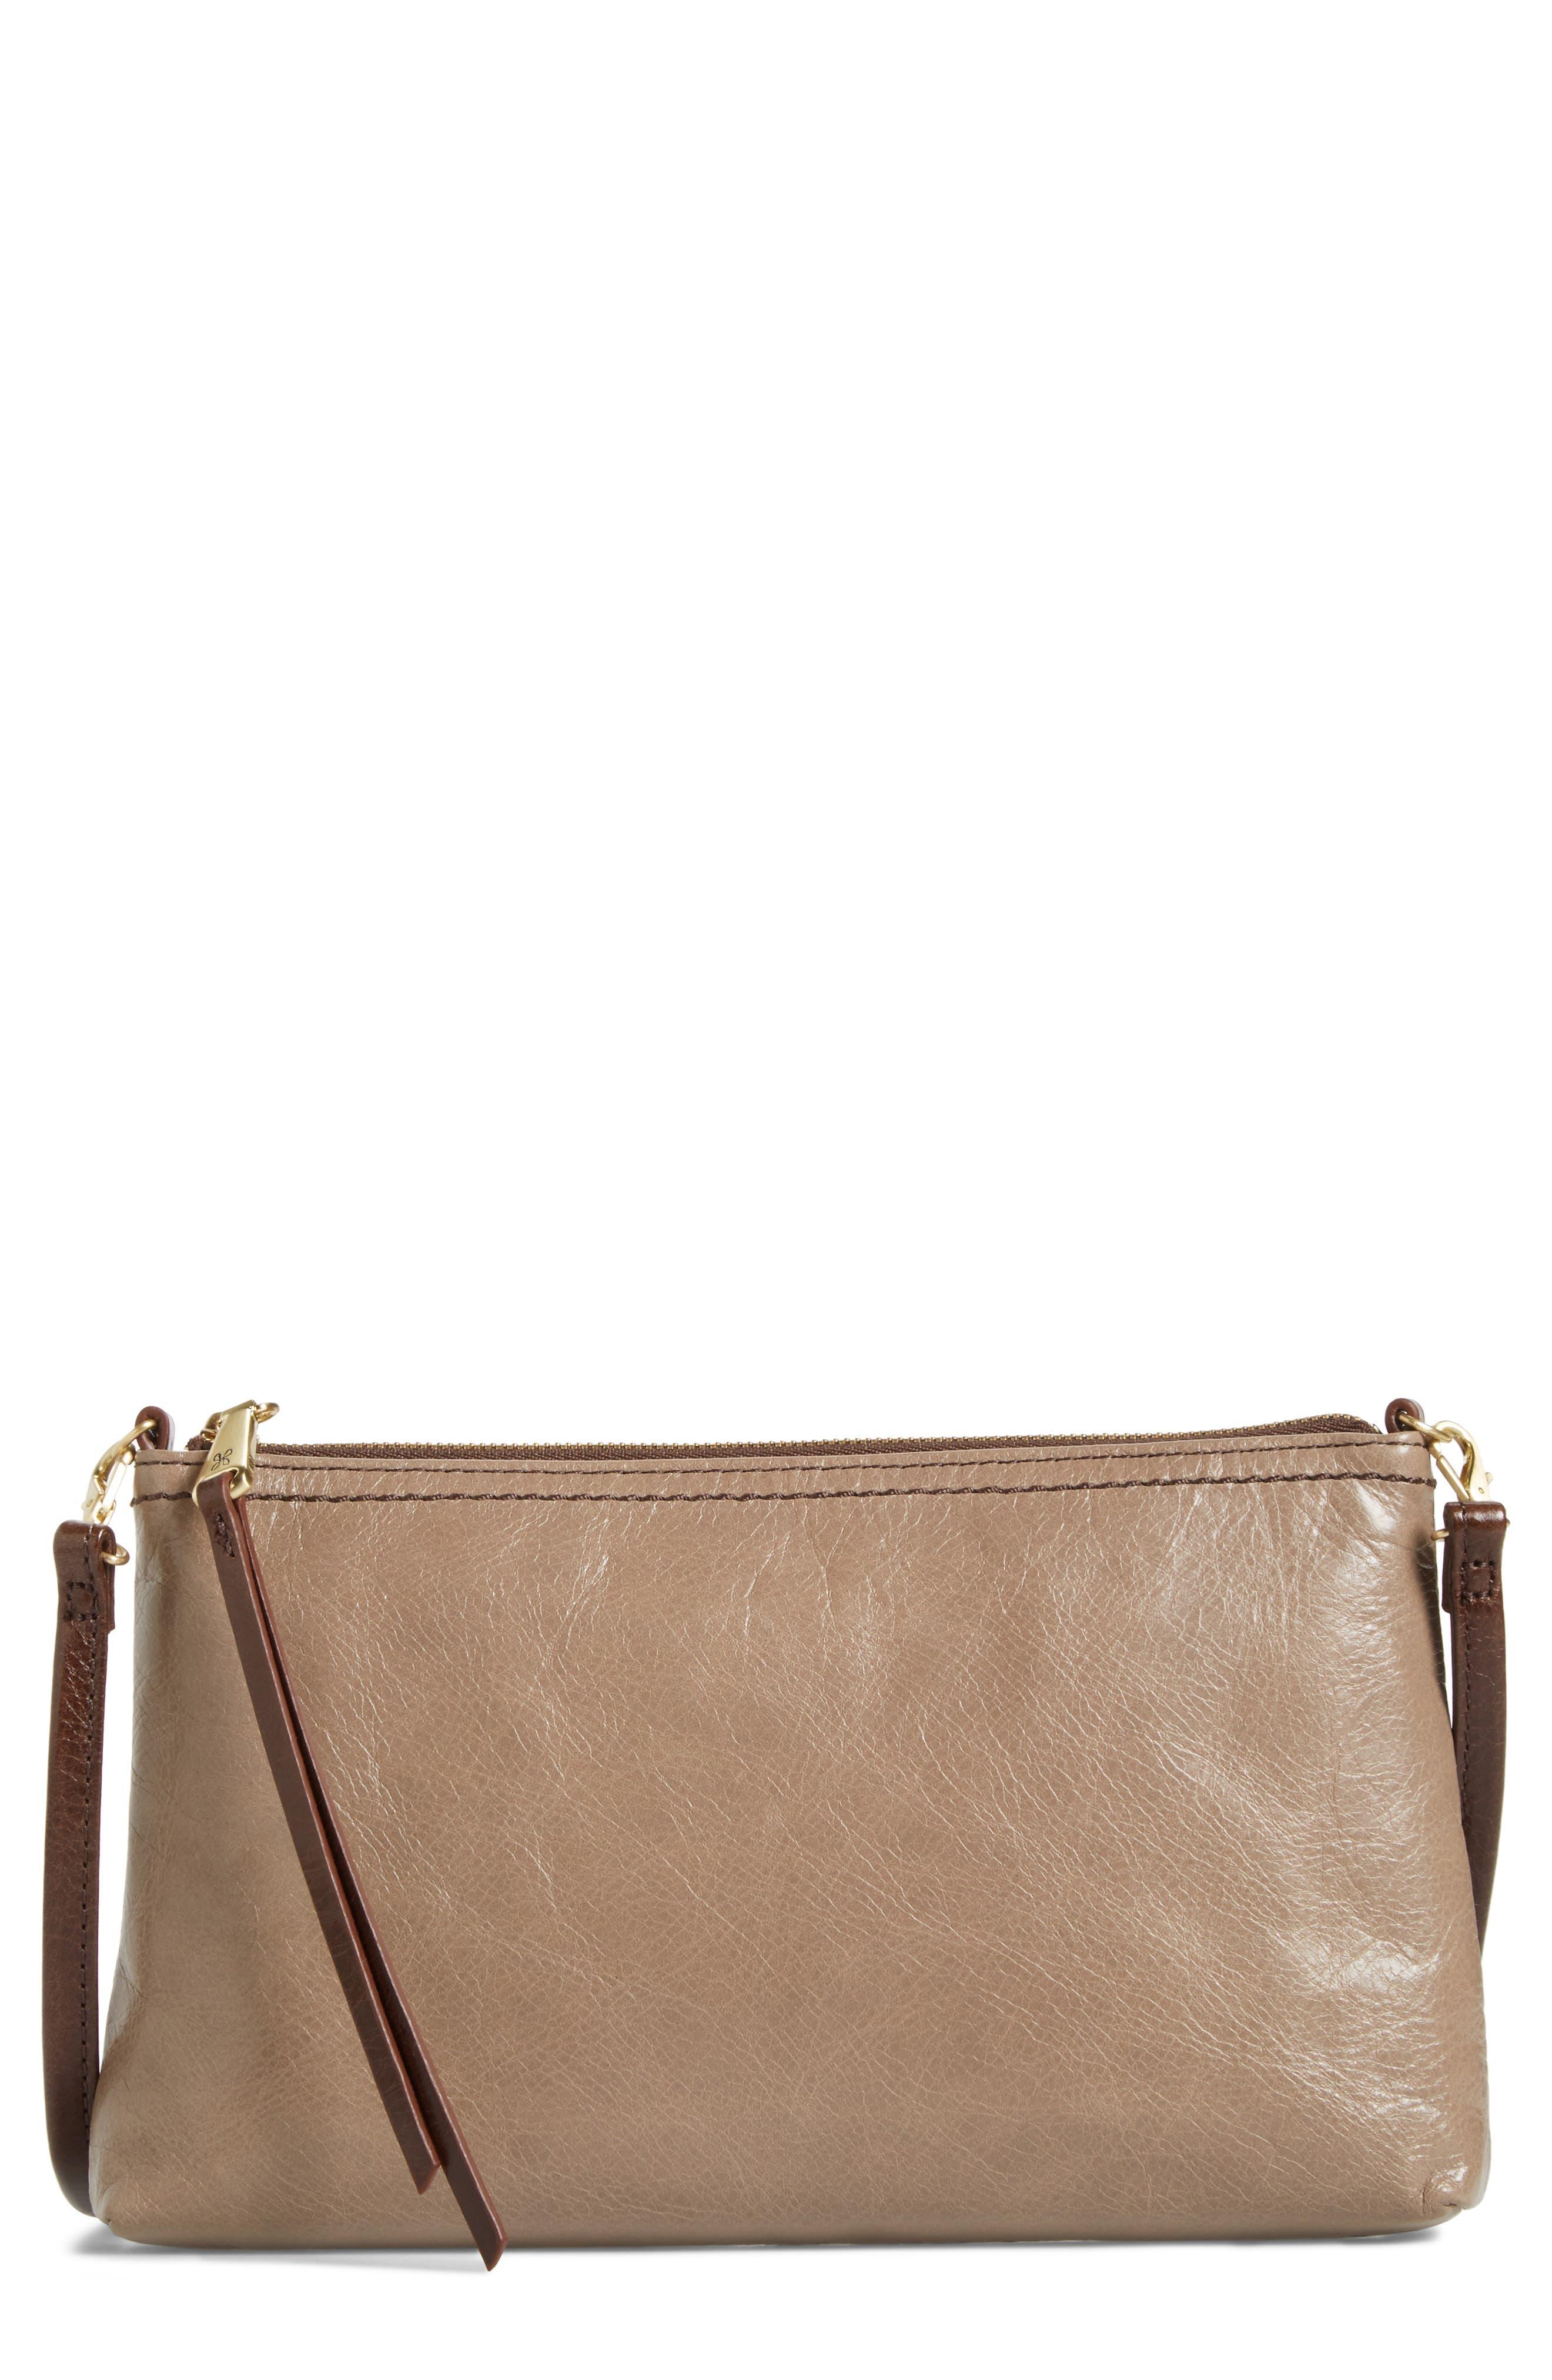 Main Image - Hobo 'Darcy' Leather Crossbody Bag